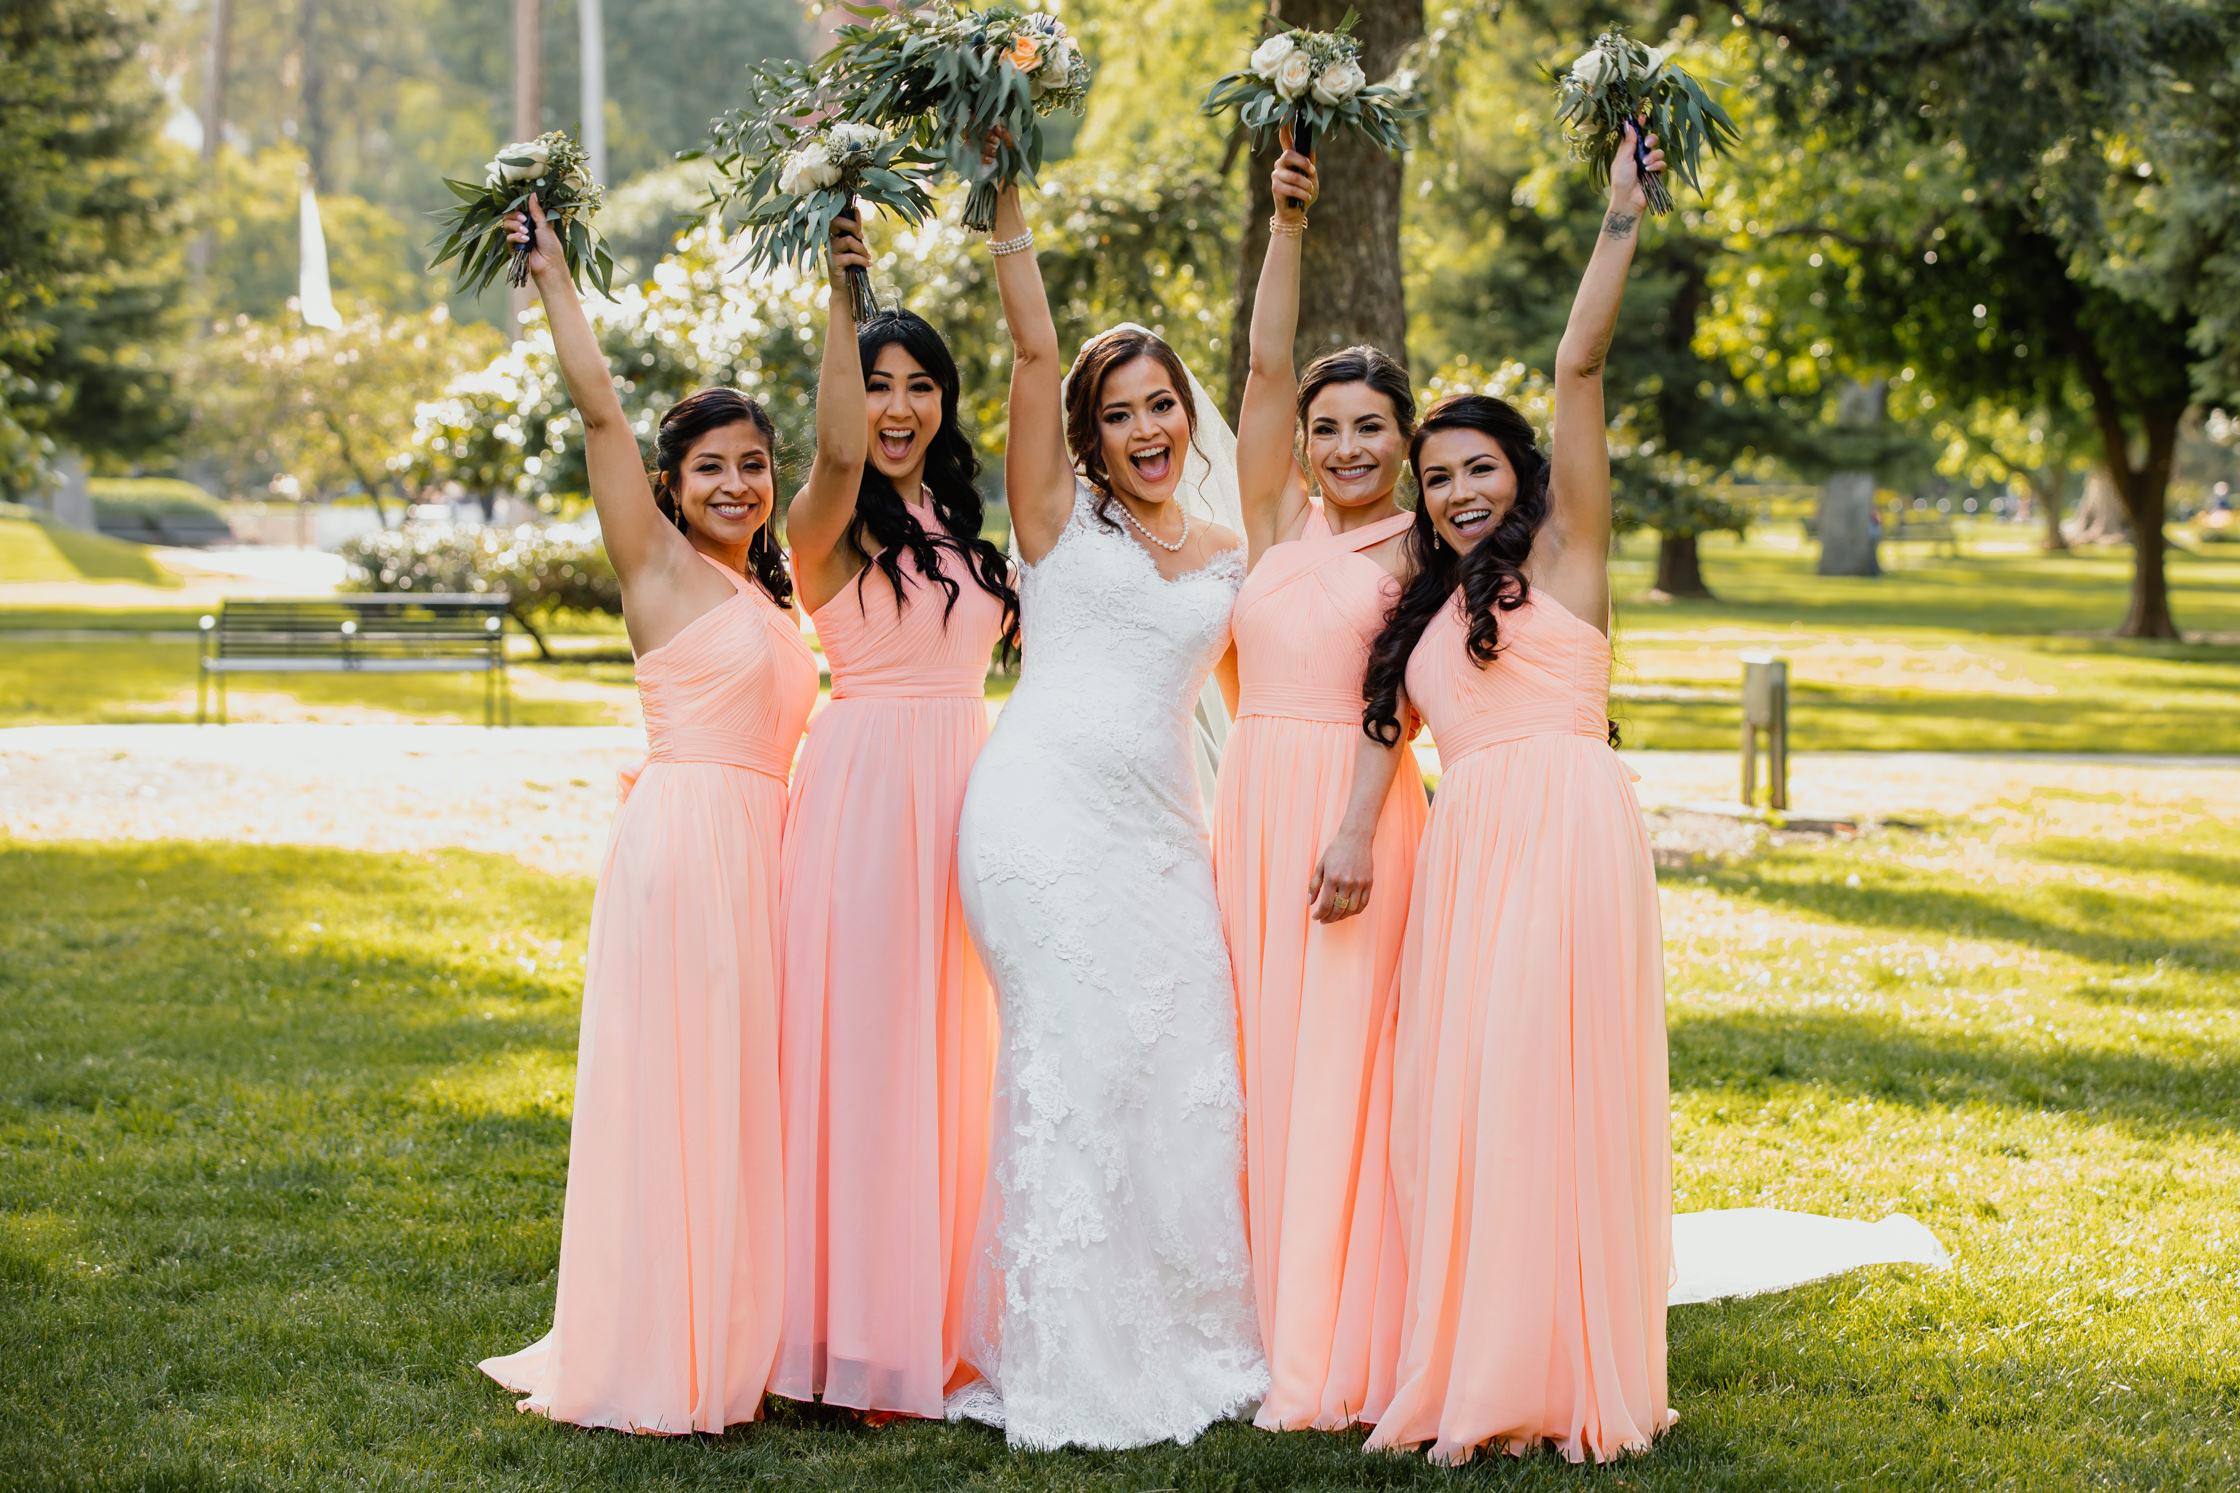 luis_joanna_wedding-59.jpg